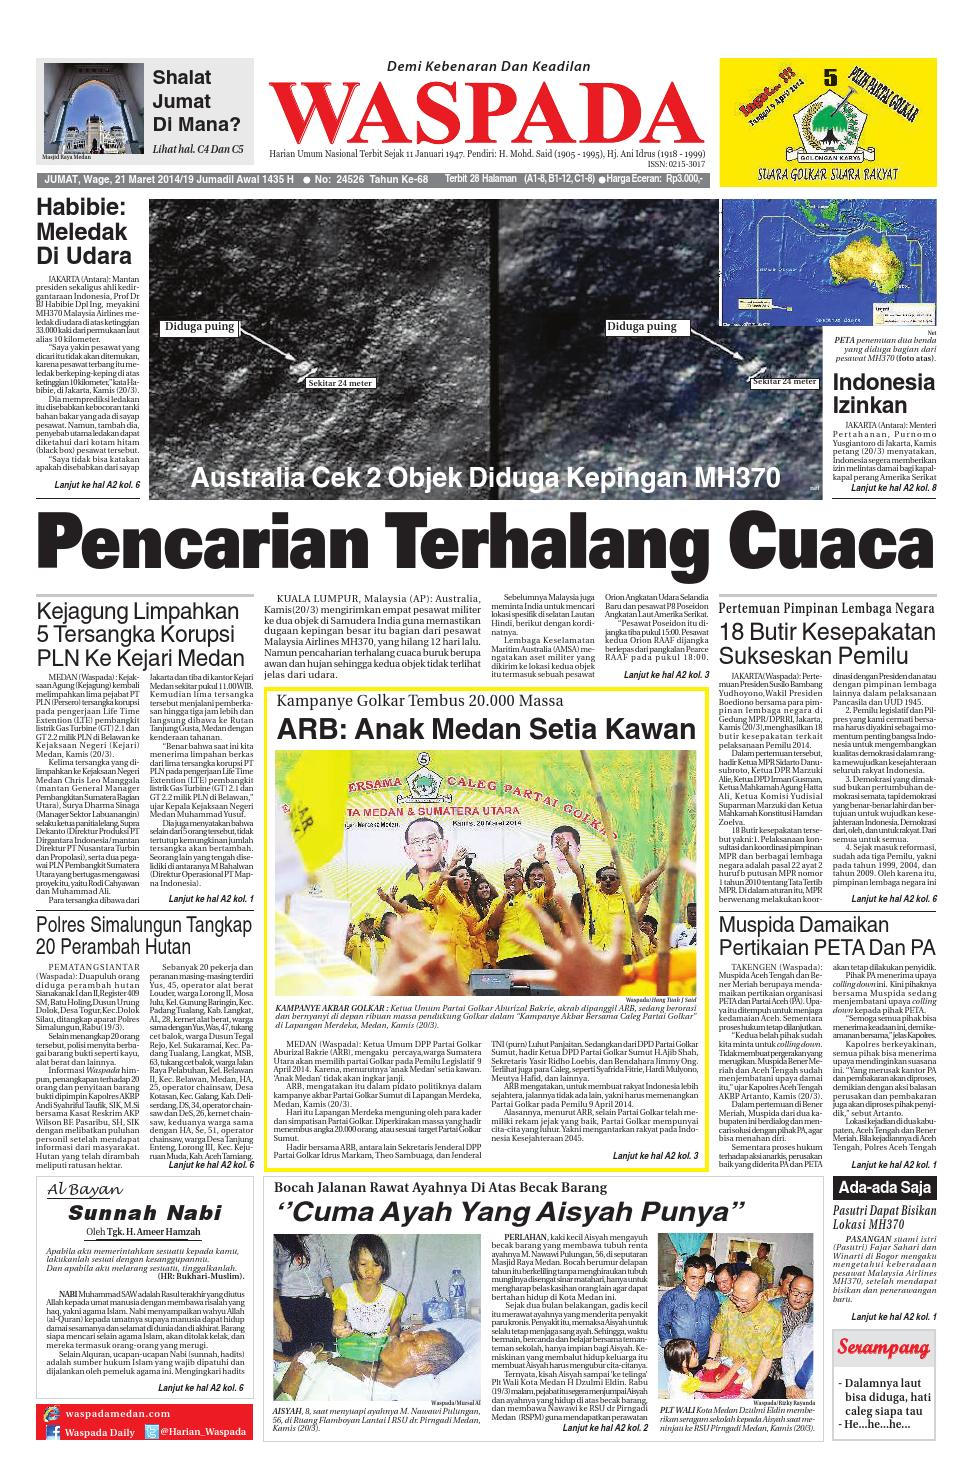 Waspada Jumat 21 Maret 2013 By Harian Issuu Rejeki Anak Soleh 3 Voucher Carrefour Rp 200000